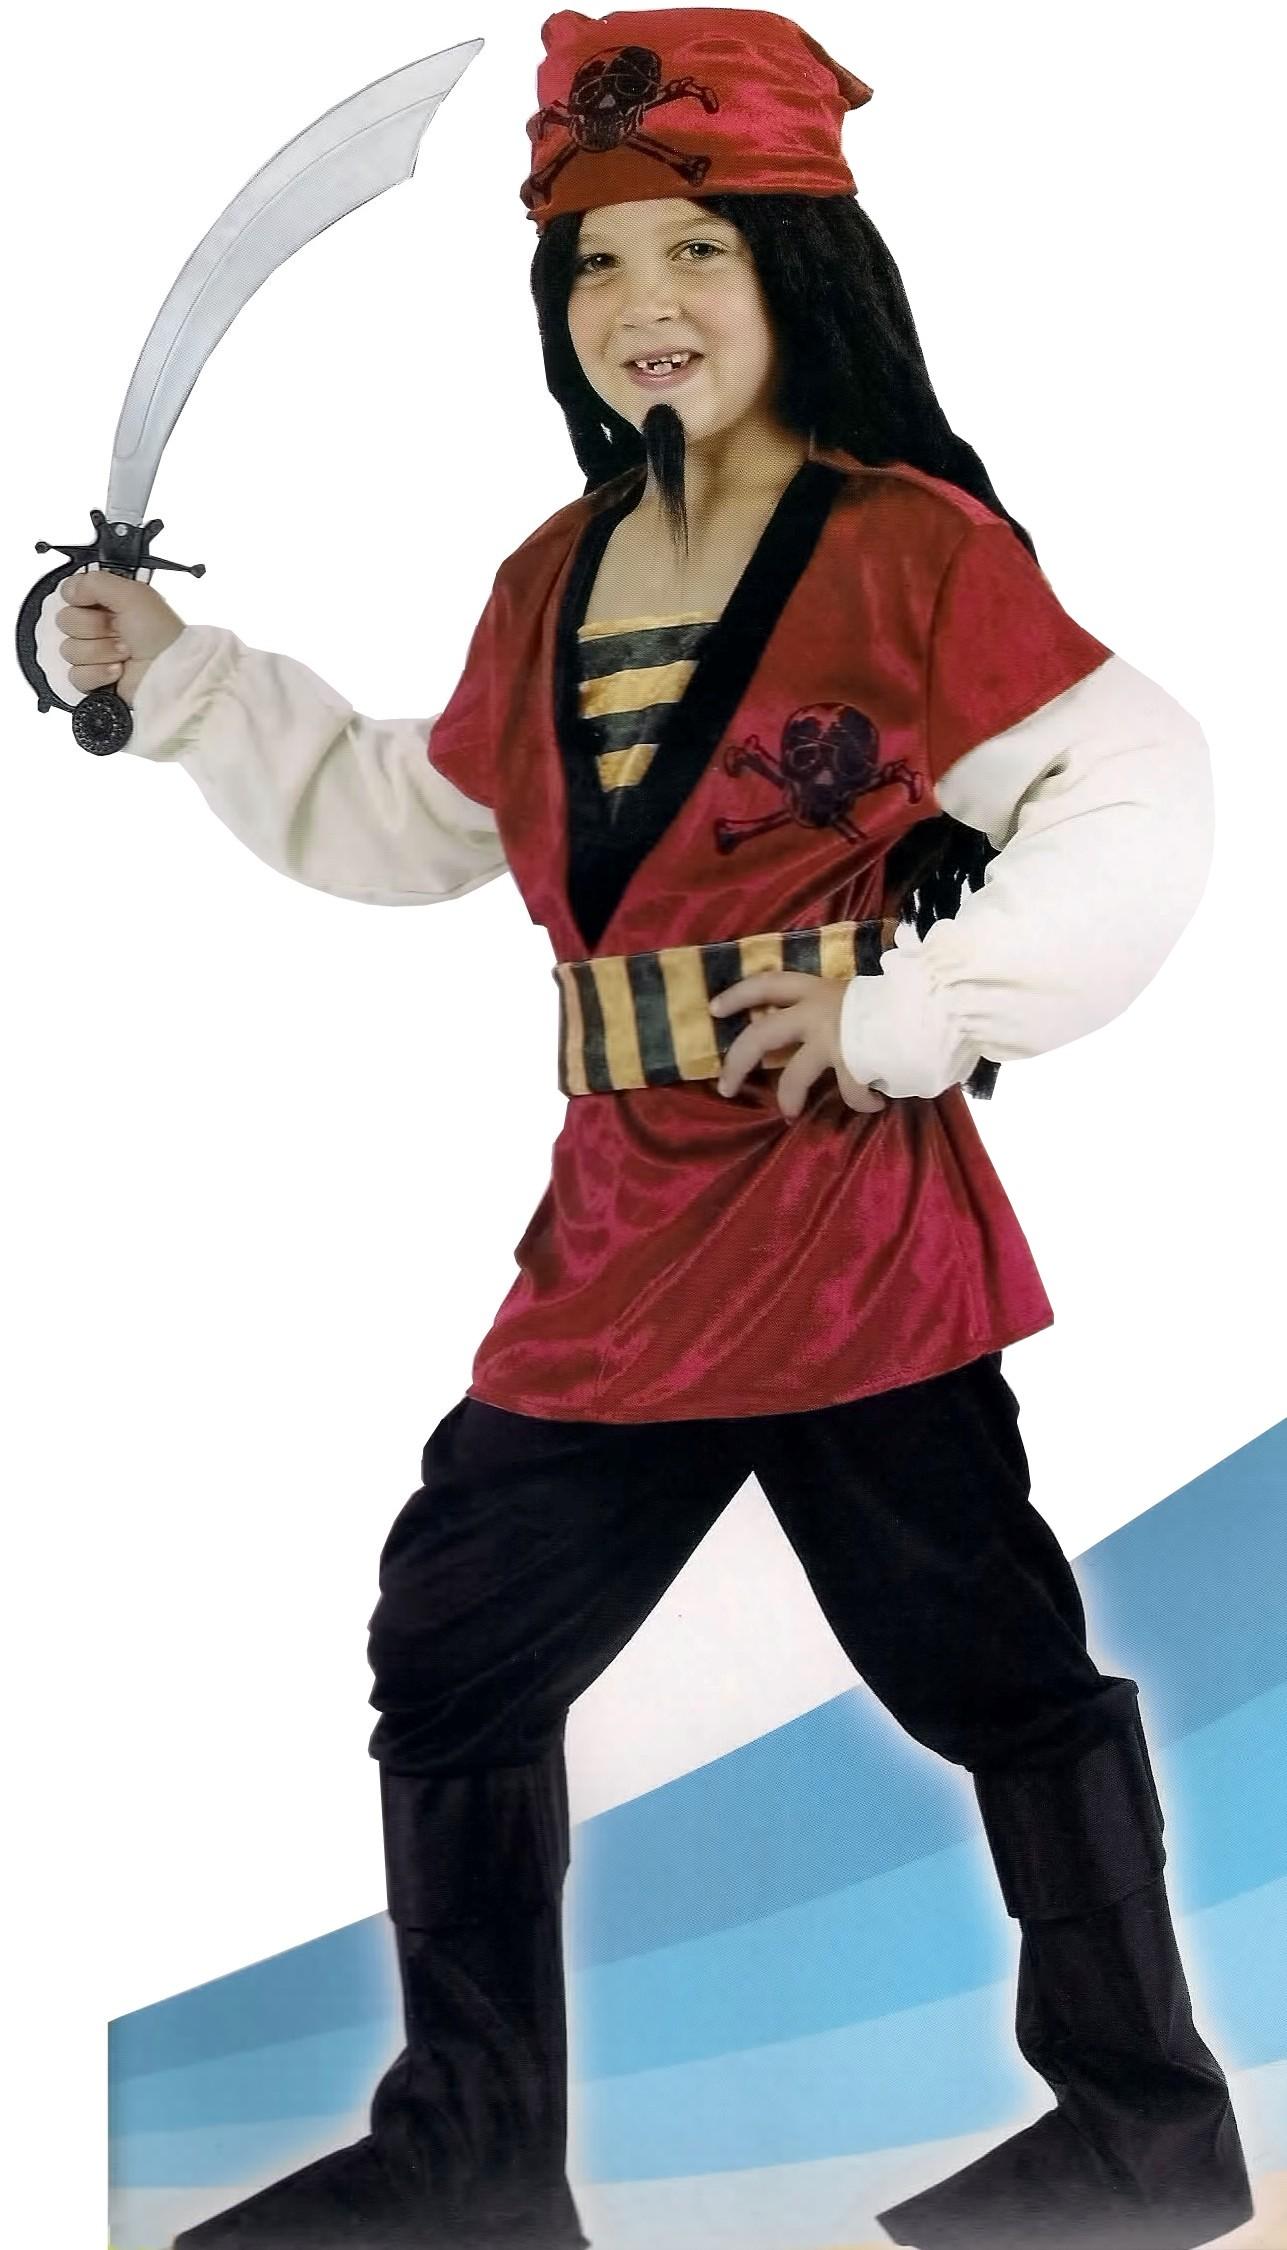 Пиратский костюм на мальчика своими руками фото 785